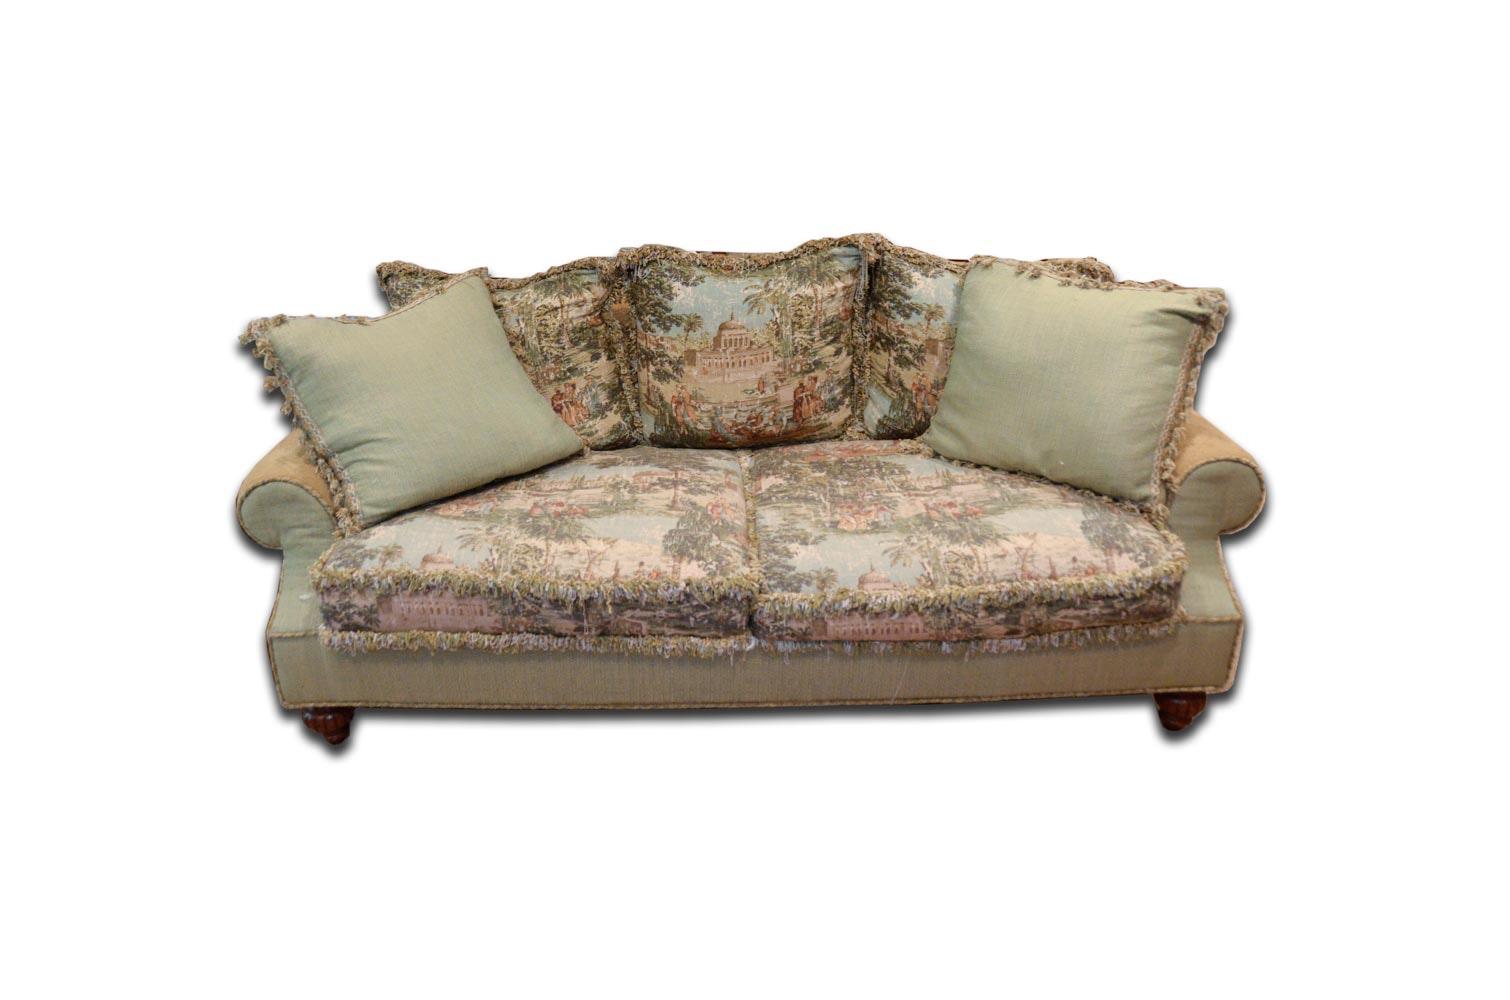 Sofa By Hickory House Furniture Company ...